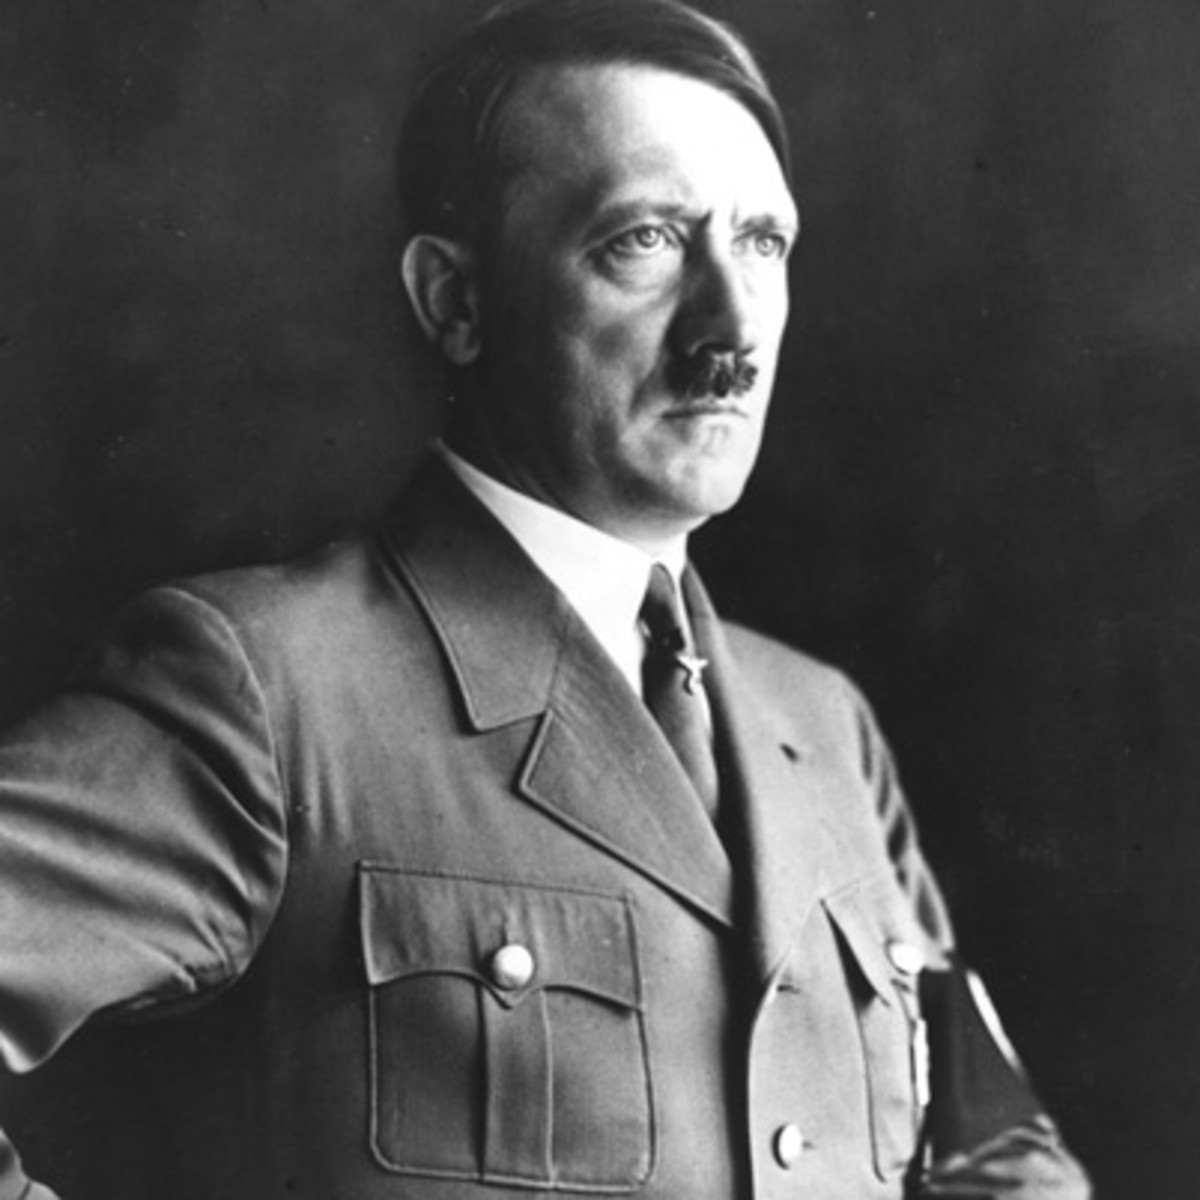 Adolf Hitler 9340144 1 402, Fatos Desconhecidos